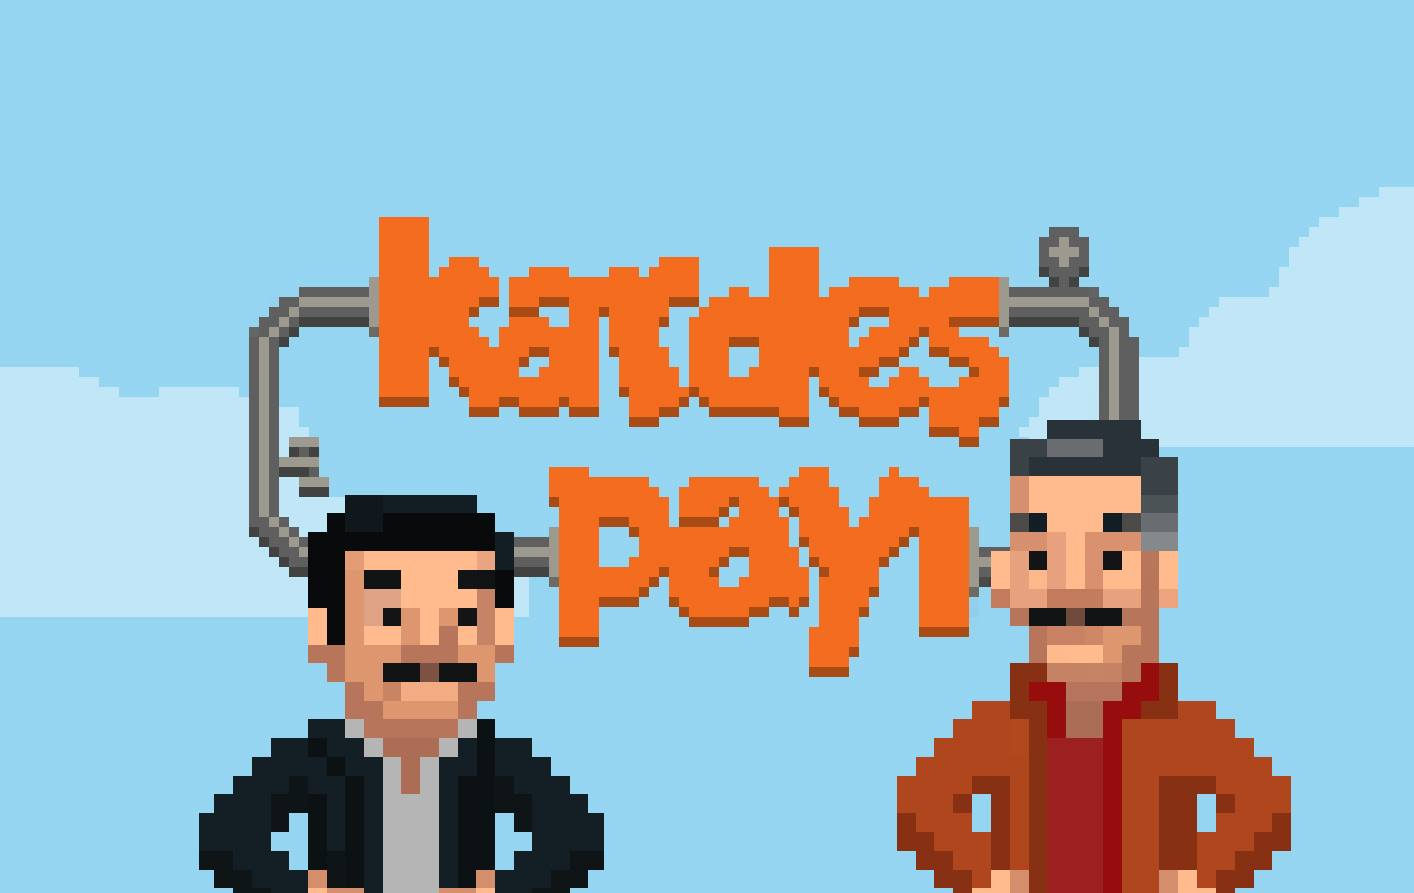 kardes_payi_pixelart_burak_cinar_00a